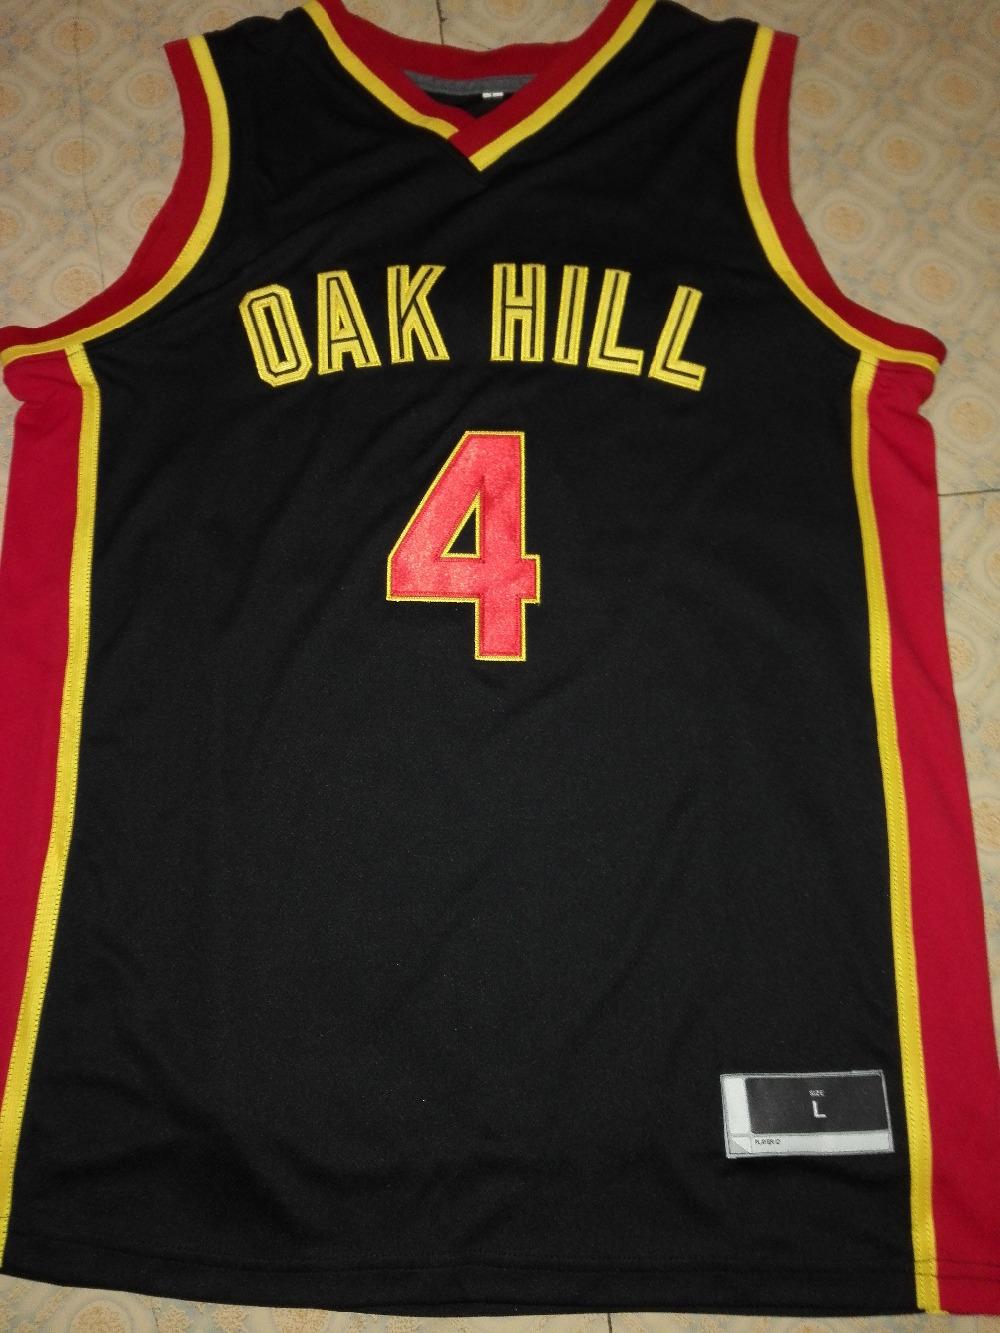 zhimoom Rajon RONDO JERSEY,#4 Rajon Rondo Oak Hill High School Throwback Basketball Jerseys, Men's Double Stitched Rajon Rondo(China (Mainland))